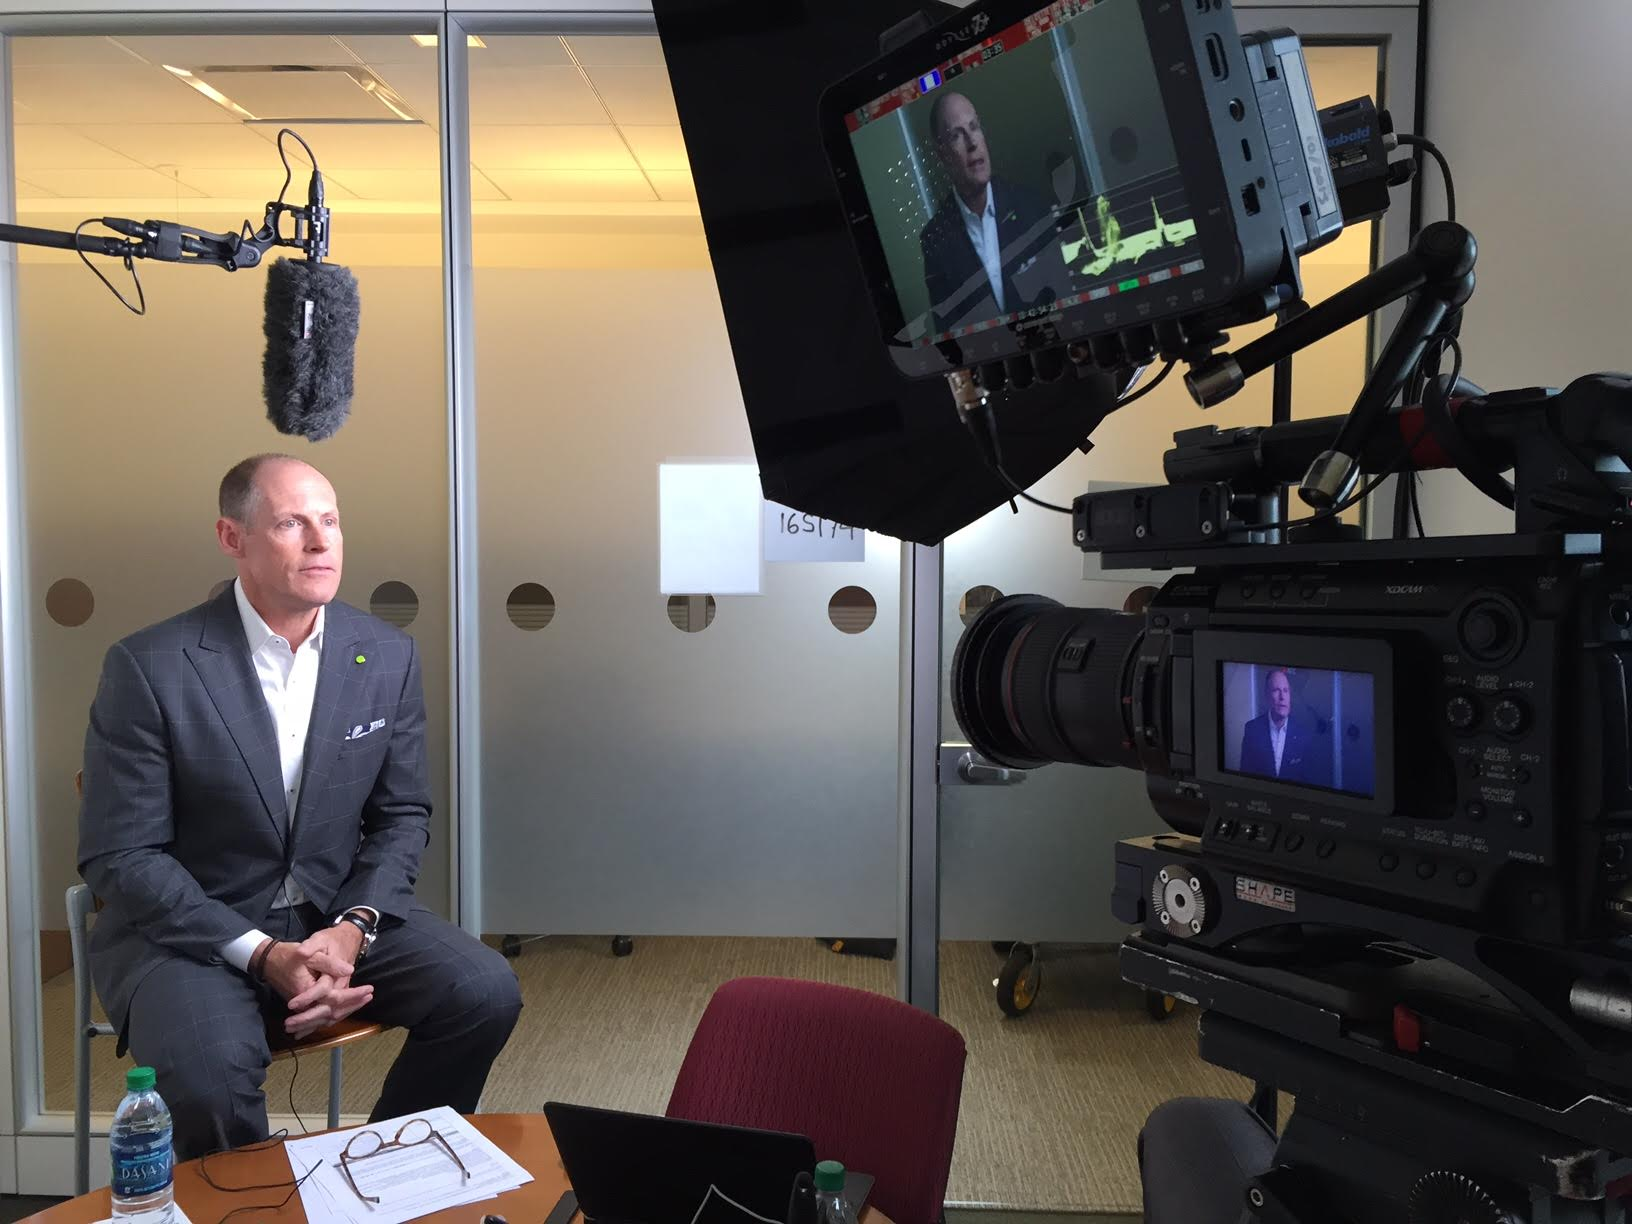 d2 Nashville Crew Films Forensic & Investigations Leader for Deloitte